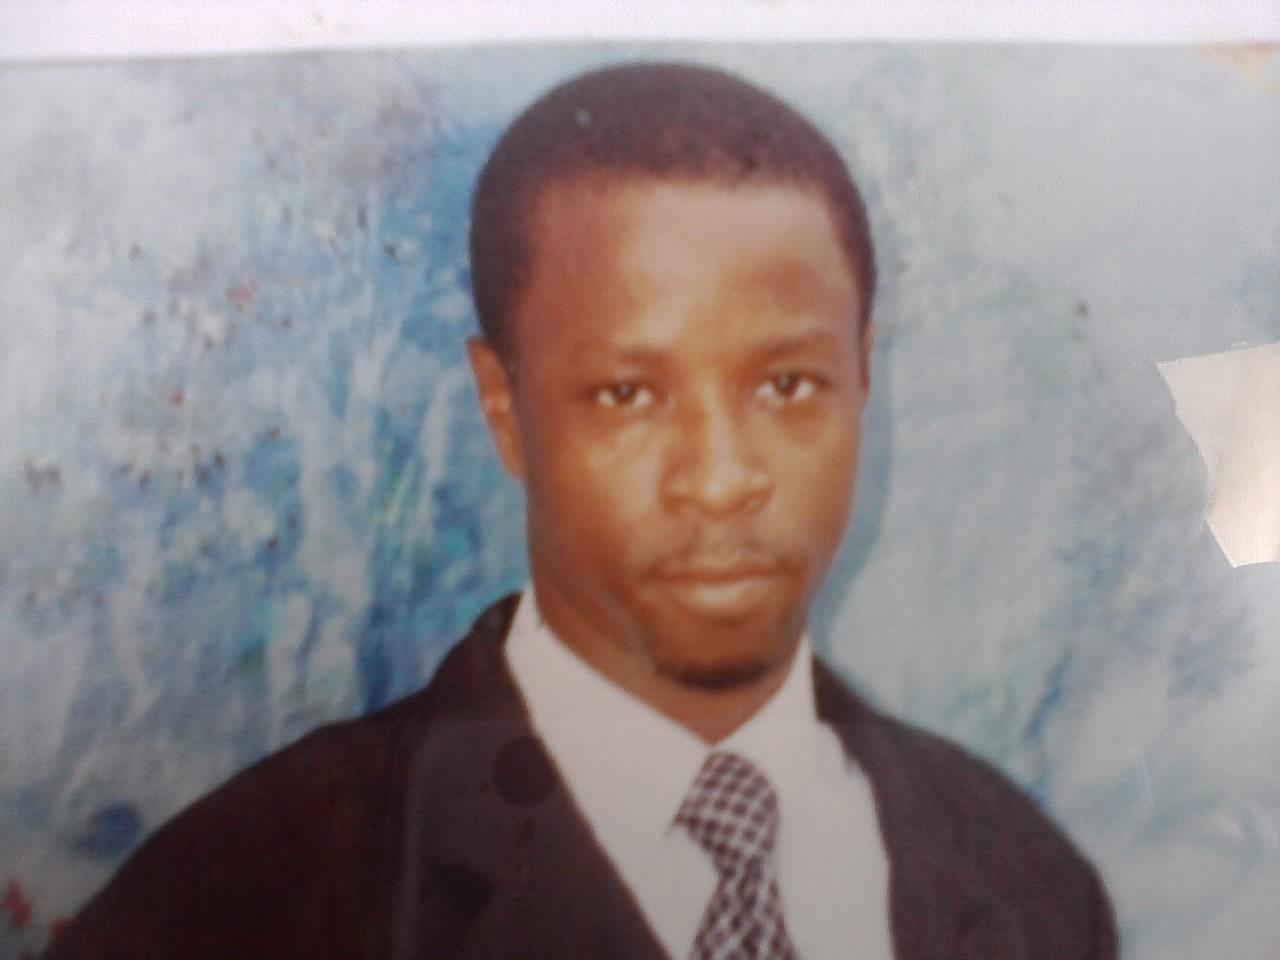 Joseph obiamiwe wilson